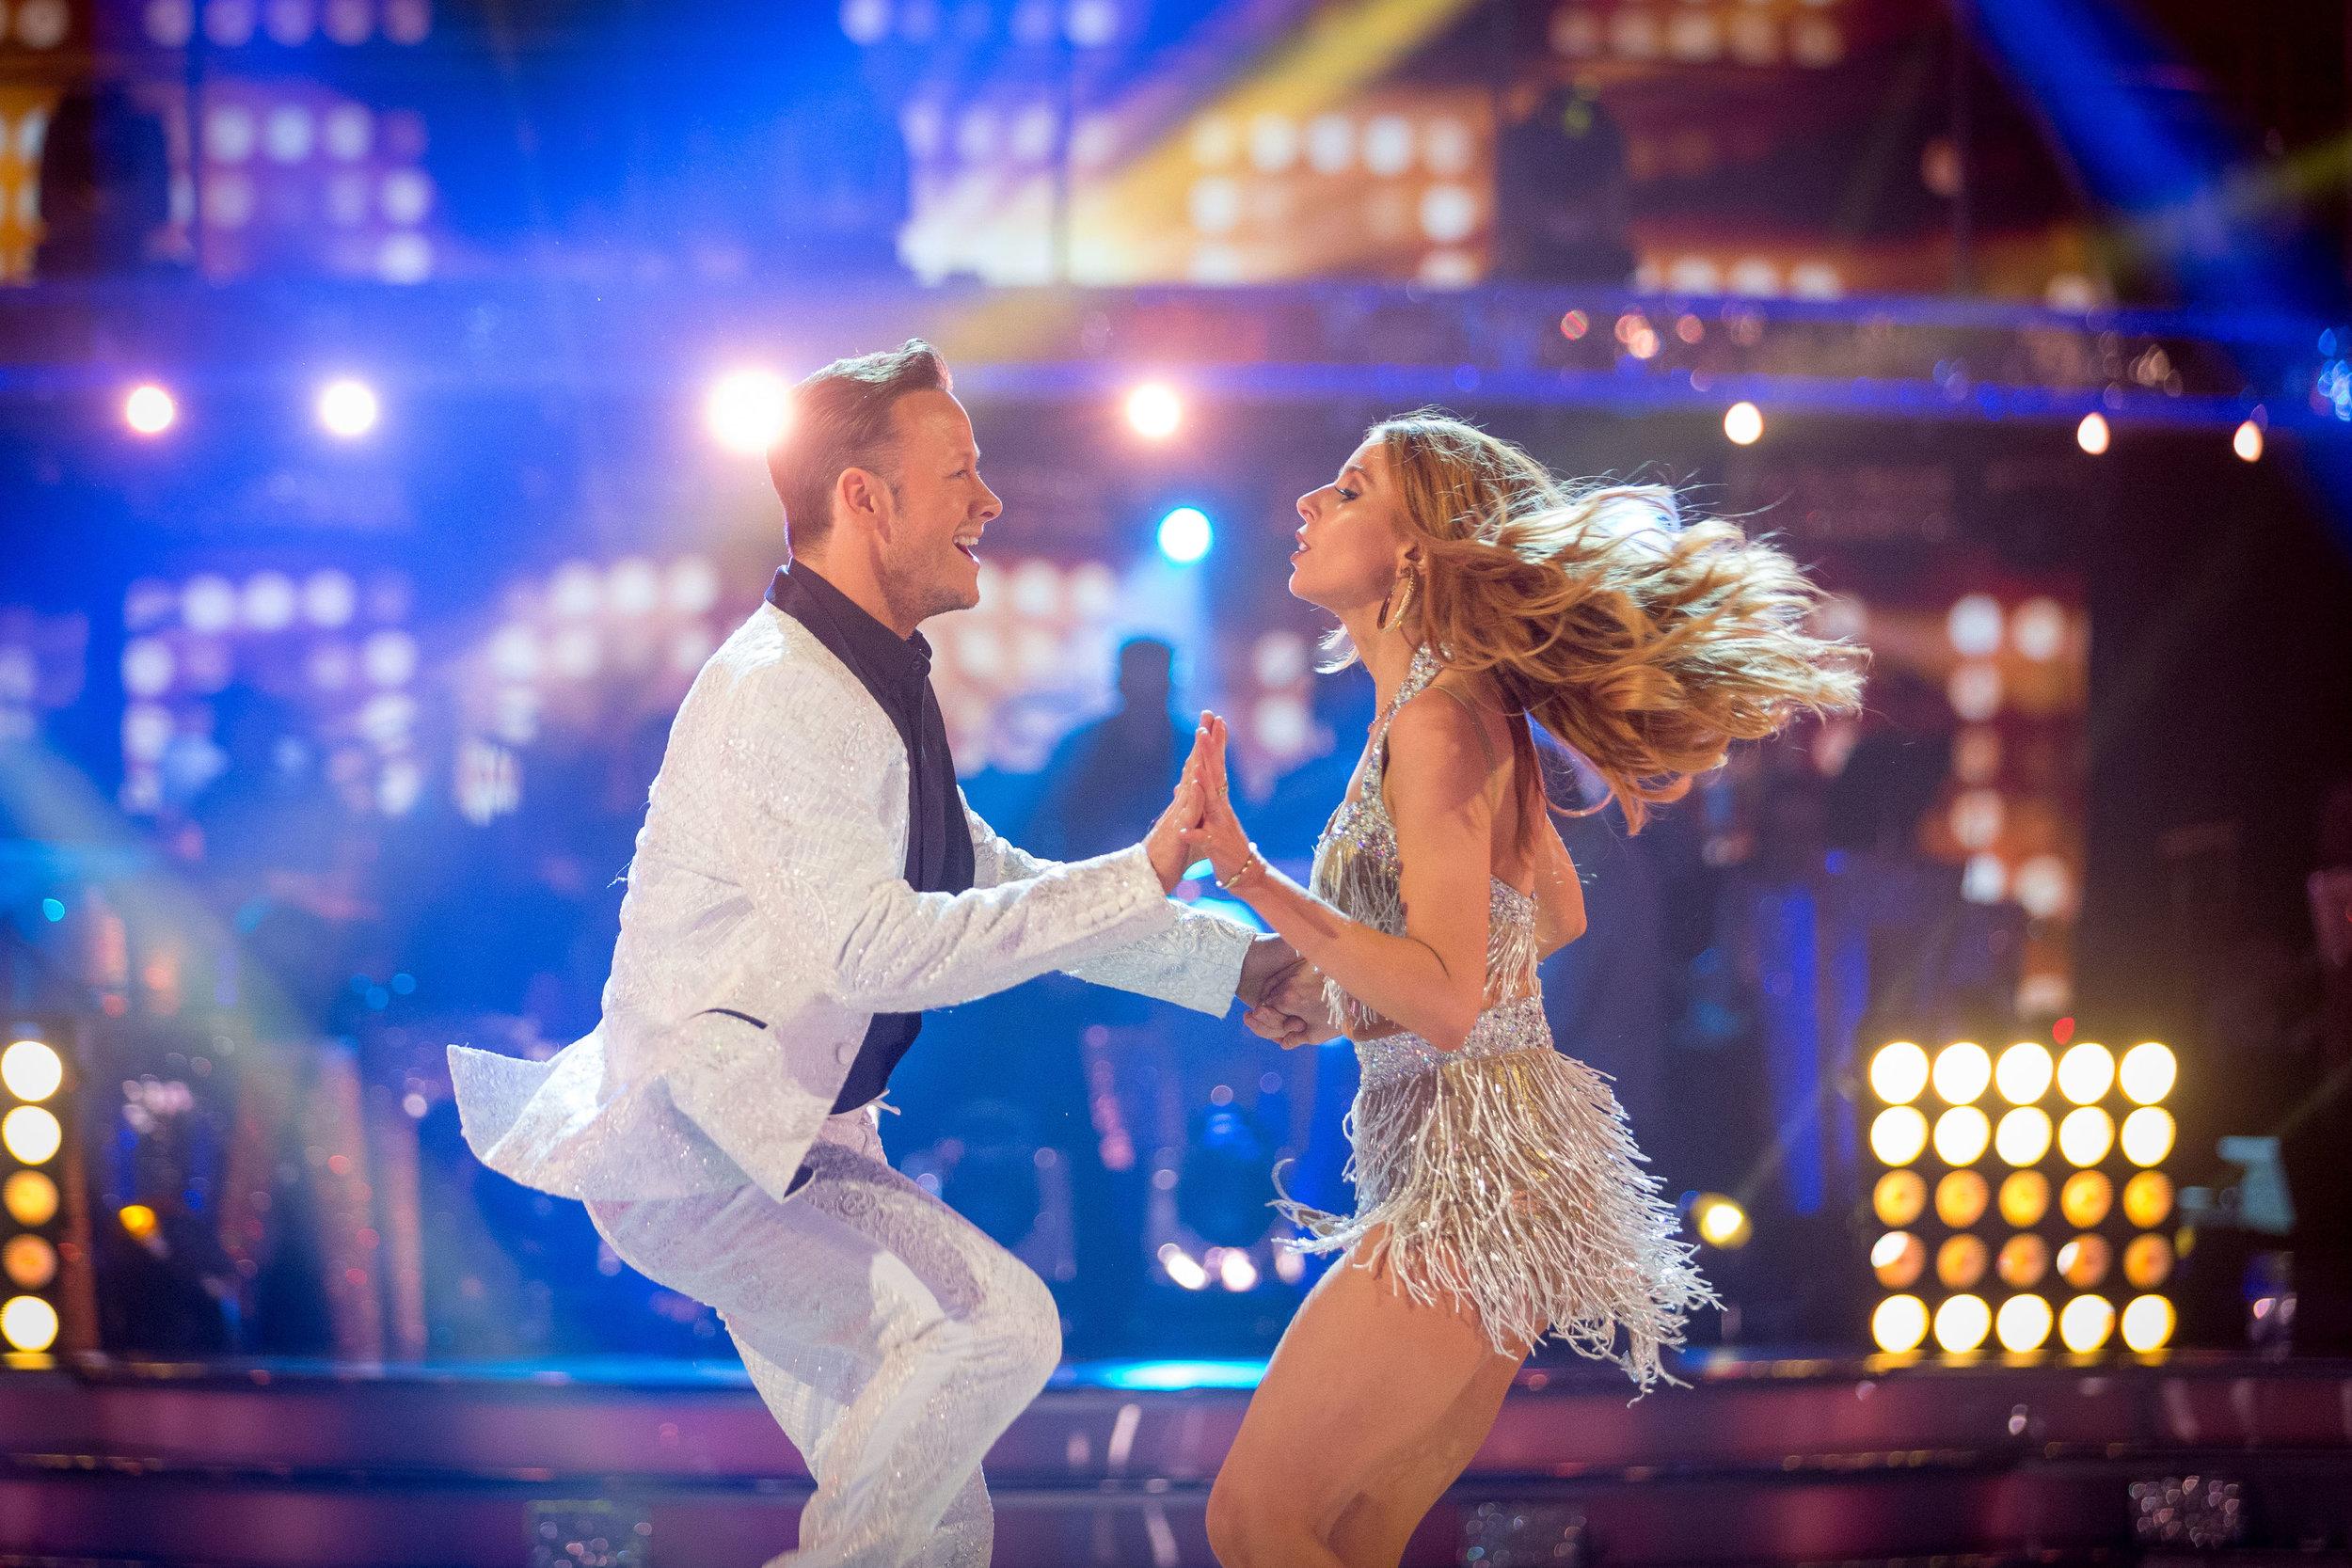 'Strictly Come Dancing' (BBC1) - Multi-platform Producer